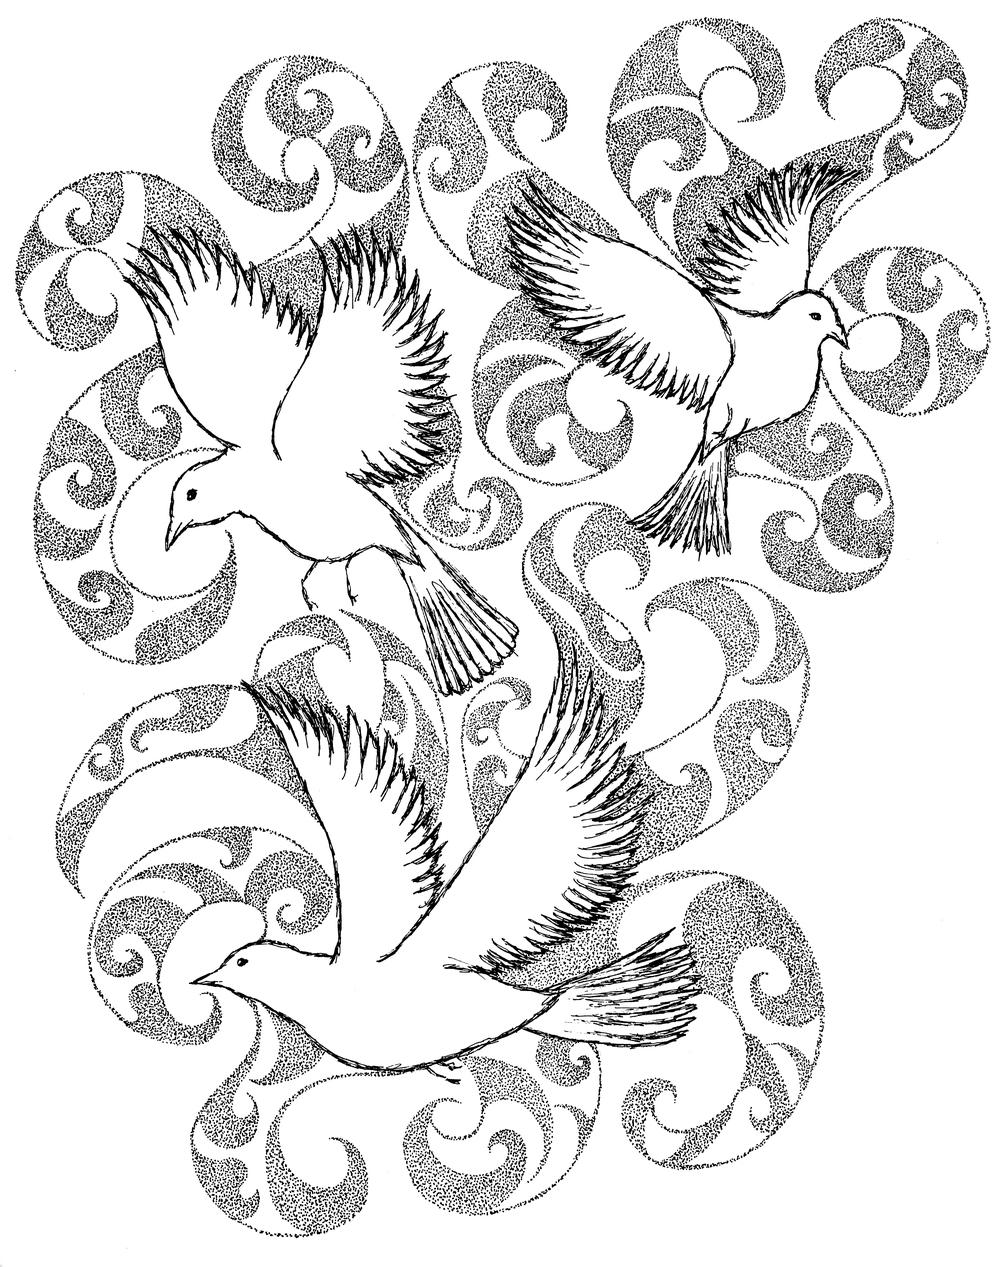 SwirlyBirds.jpg